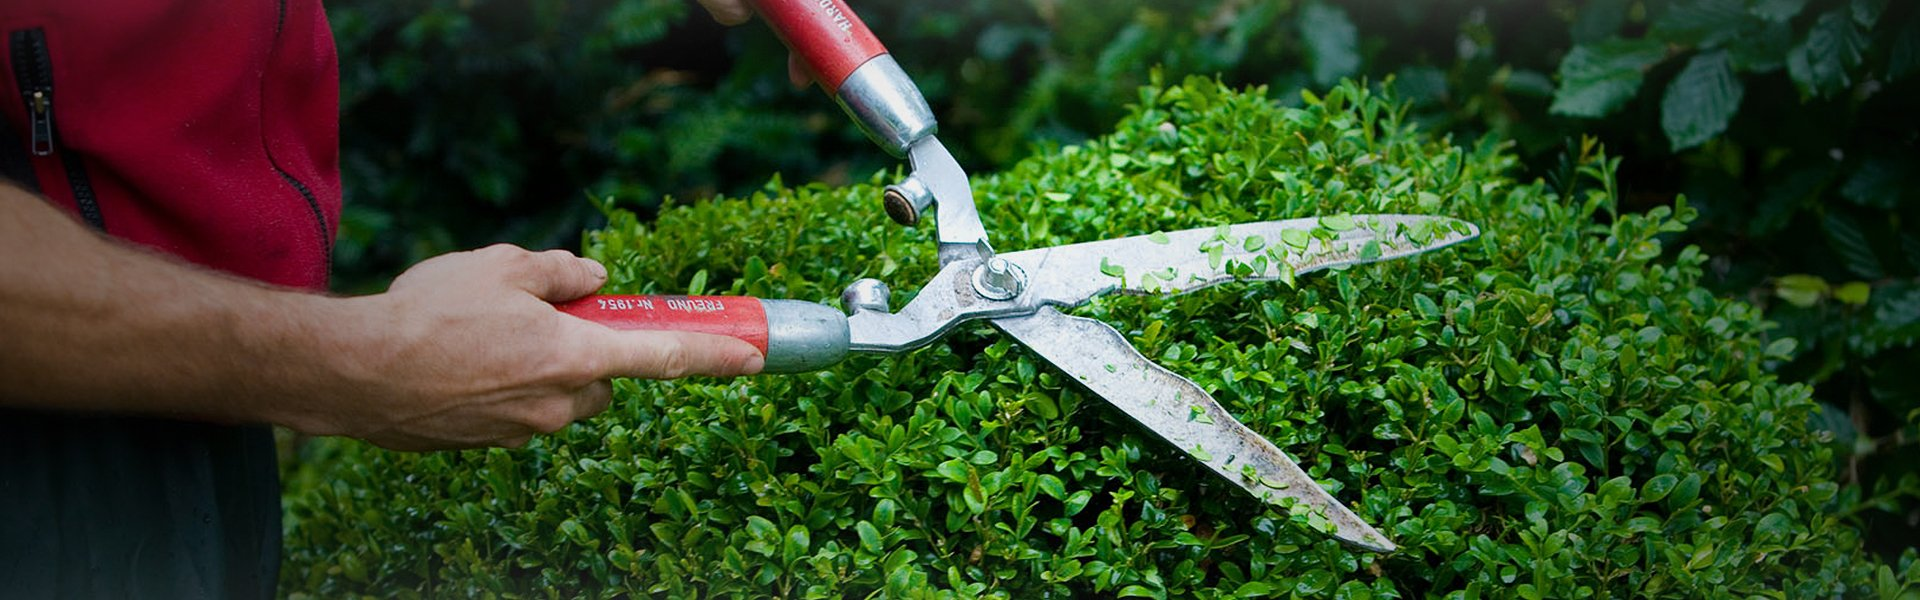 Branch pruning service